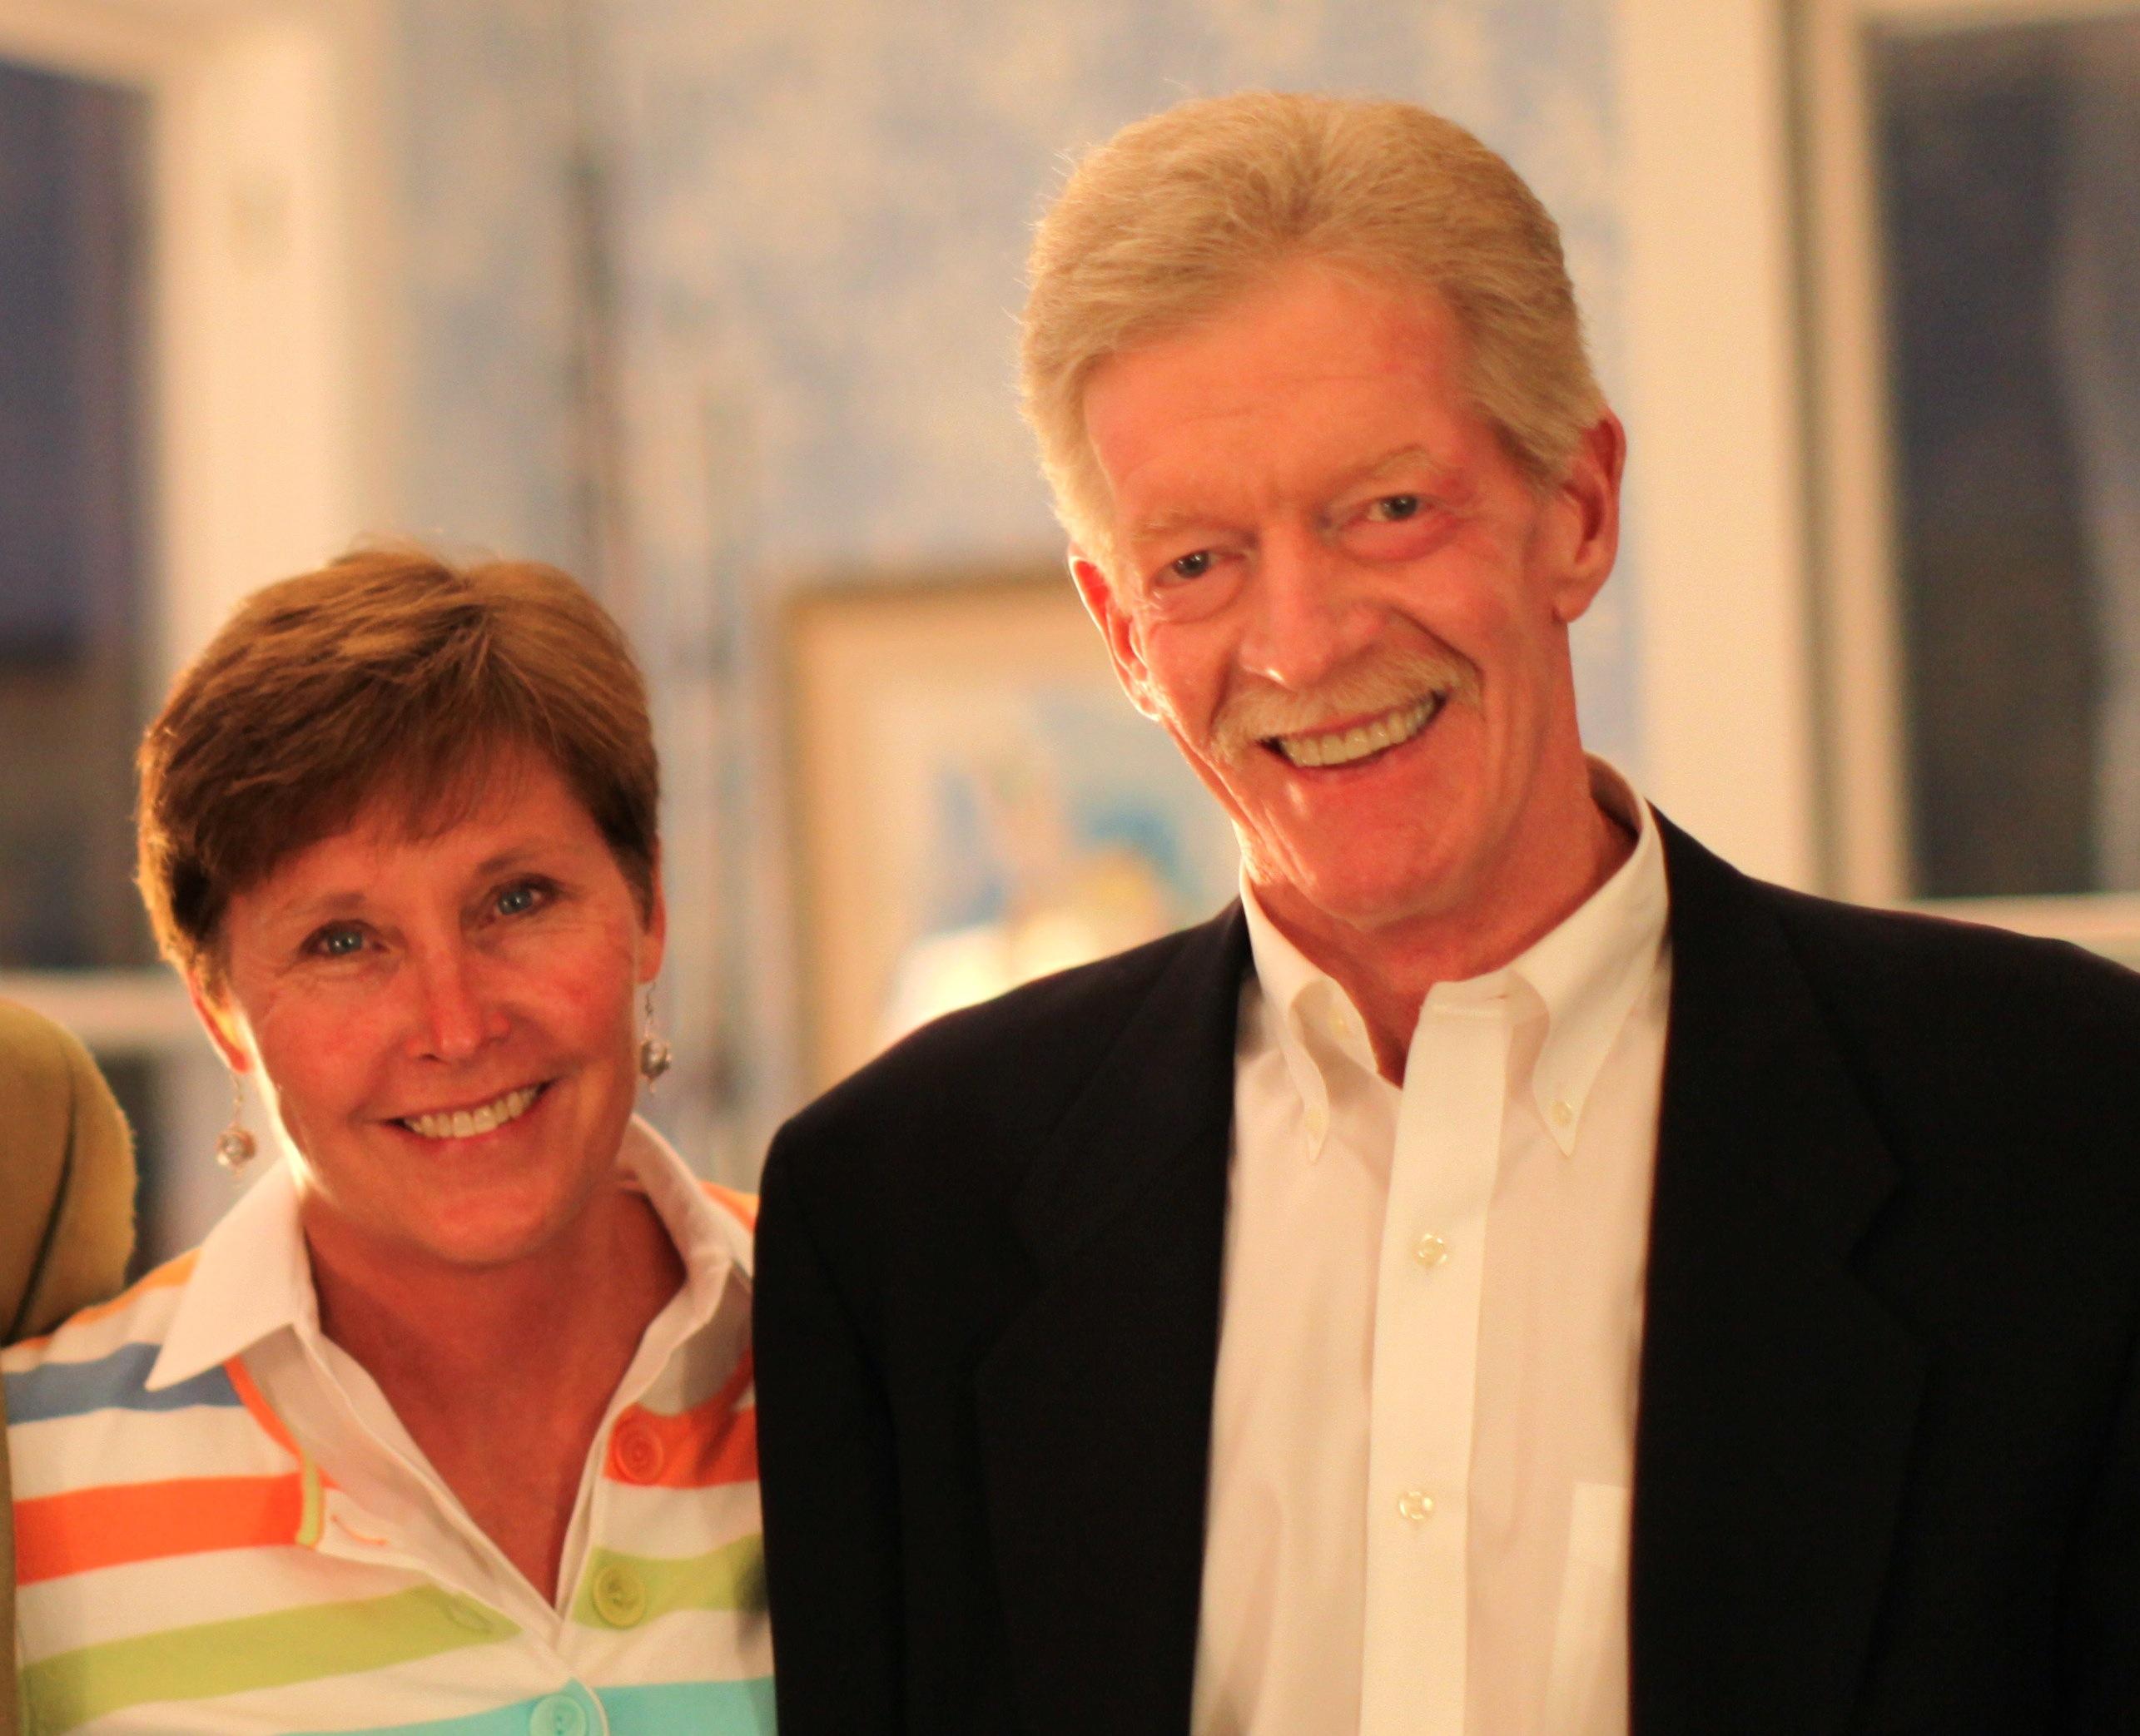 Nancy Ditz and Bruce Mosbacher